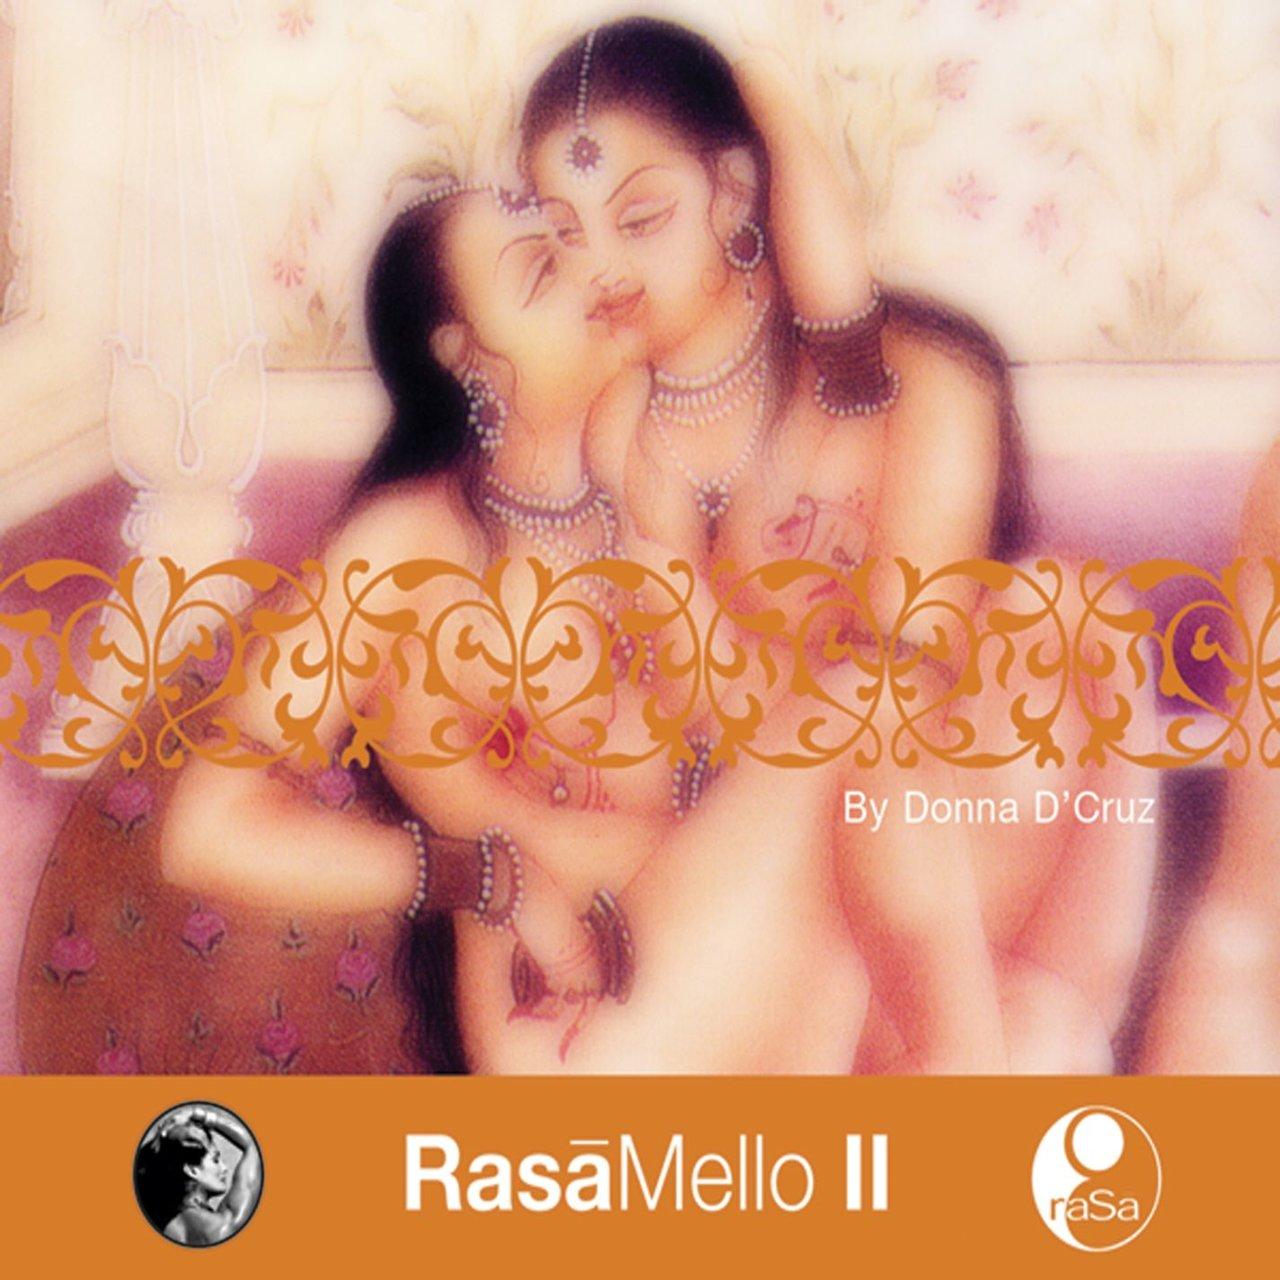 Rasa Mello II